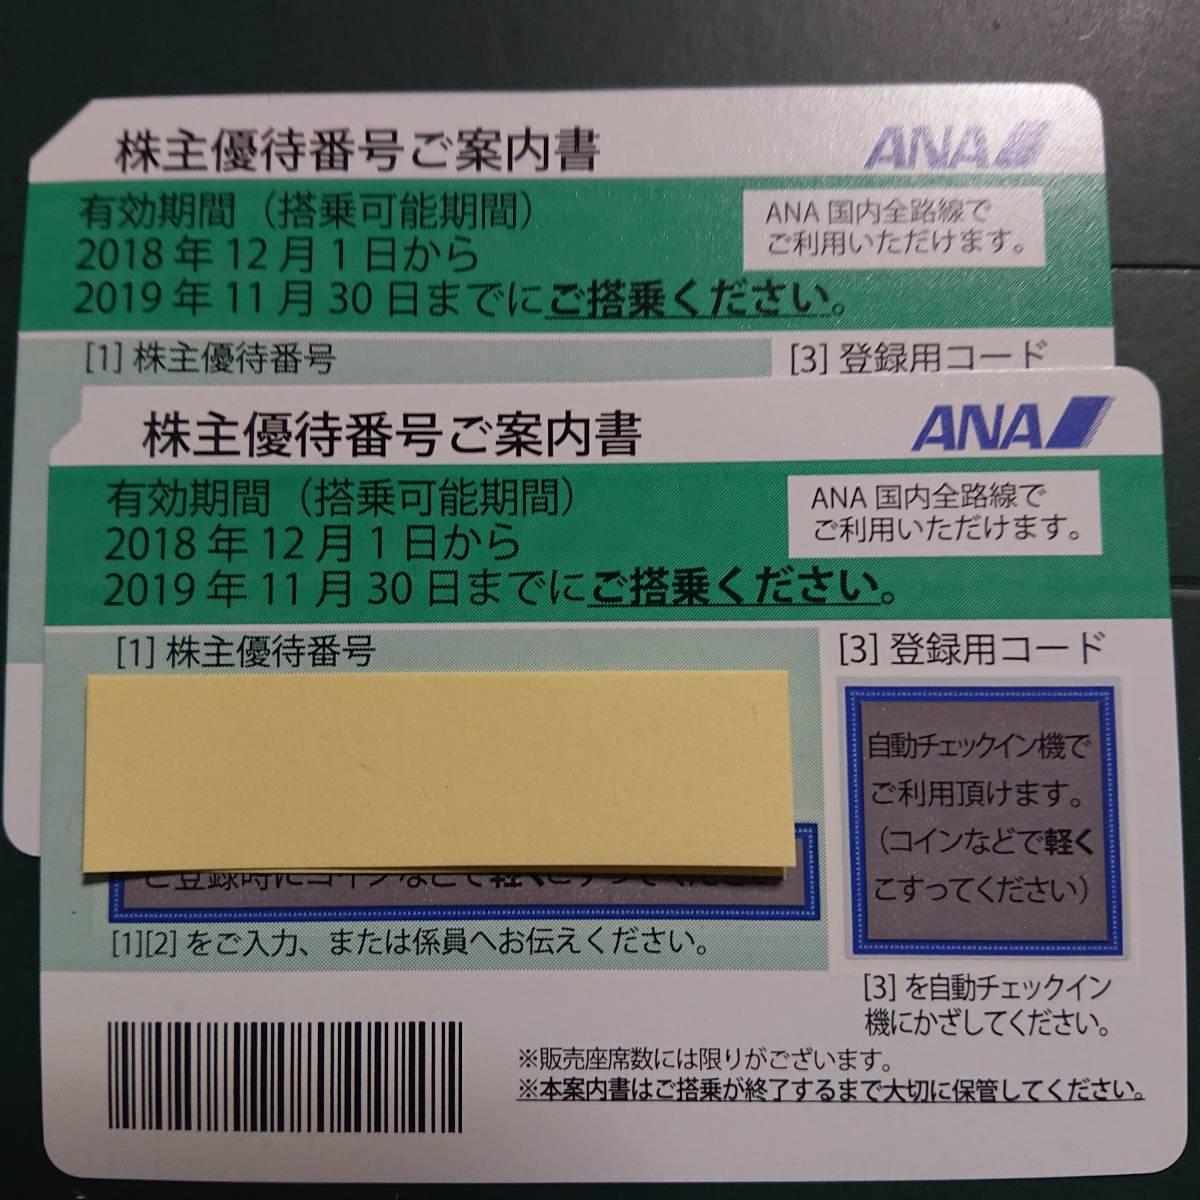 ANA株主優待券2枚セット(有効期限2019年11月30日まで)ANAグループ優待券つき、匿名配送_画像2